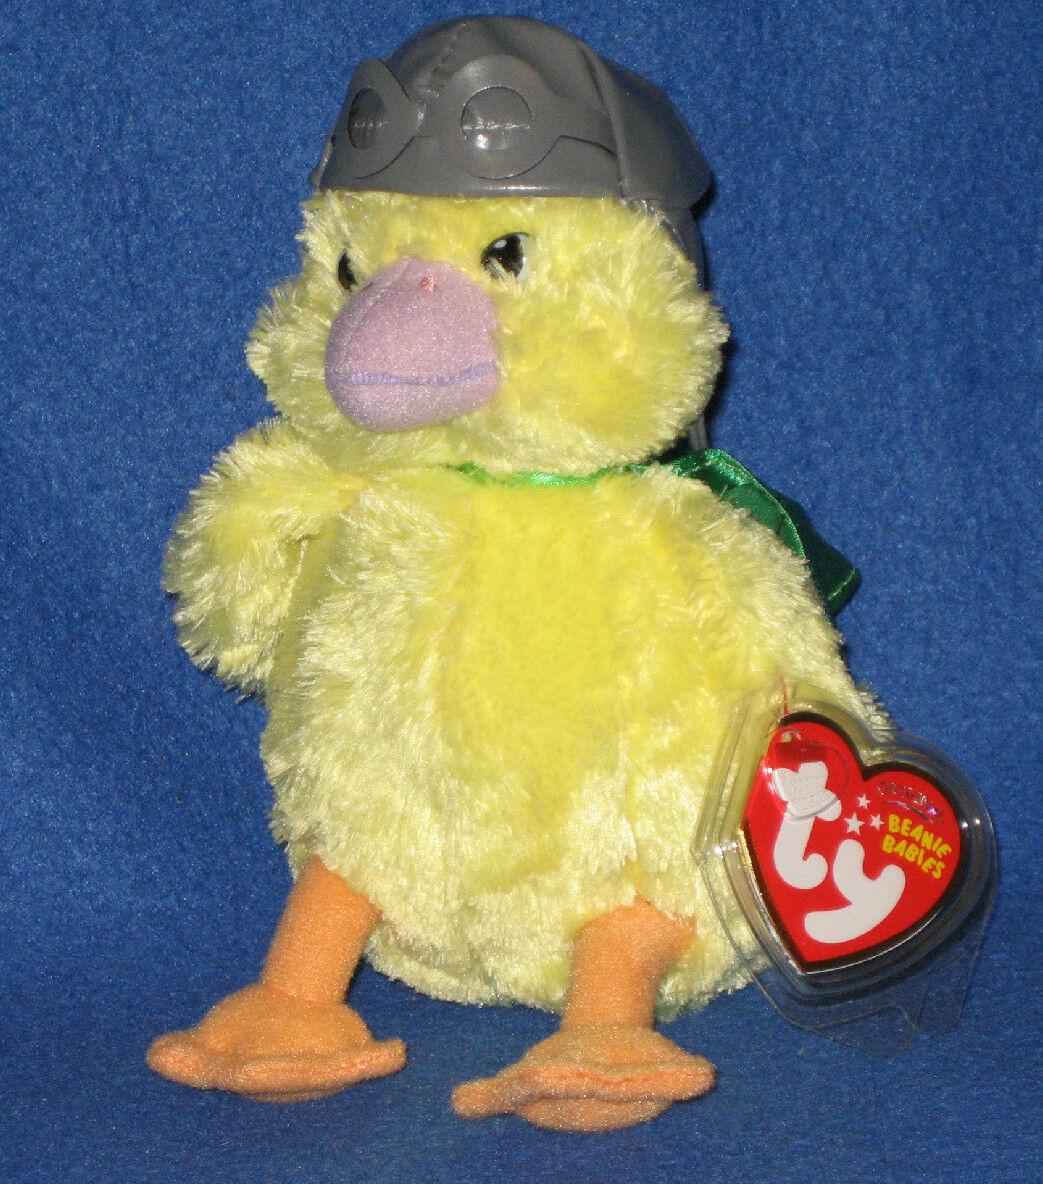 bf378cf4cd4 Ty Ming-ming Duck Nickelodeon Wonder Pets Nick (6